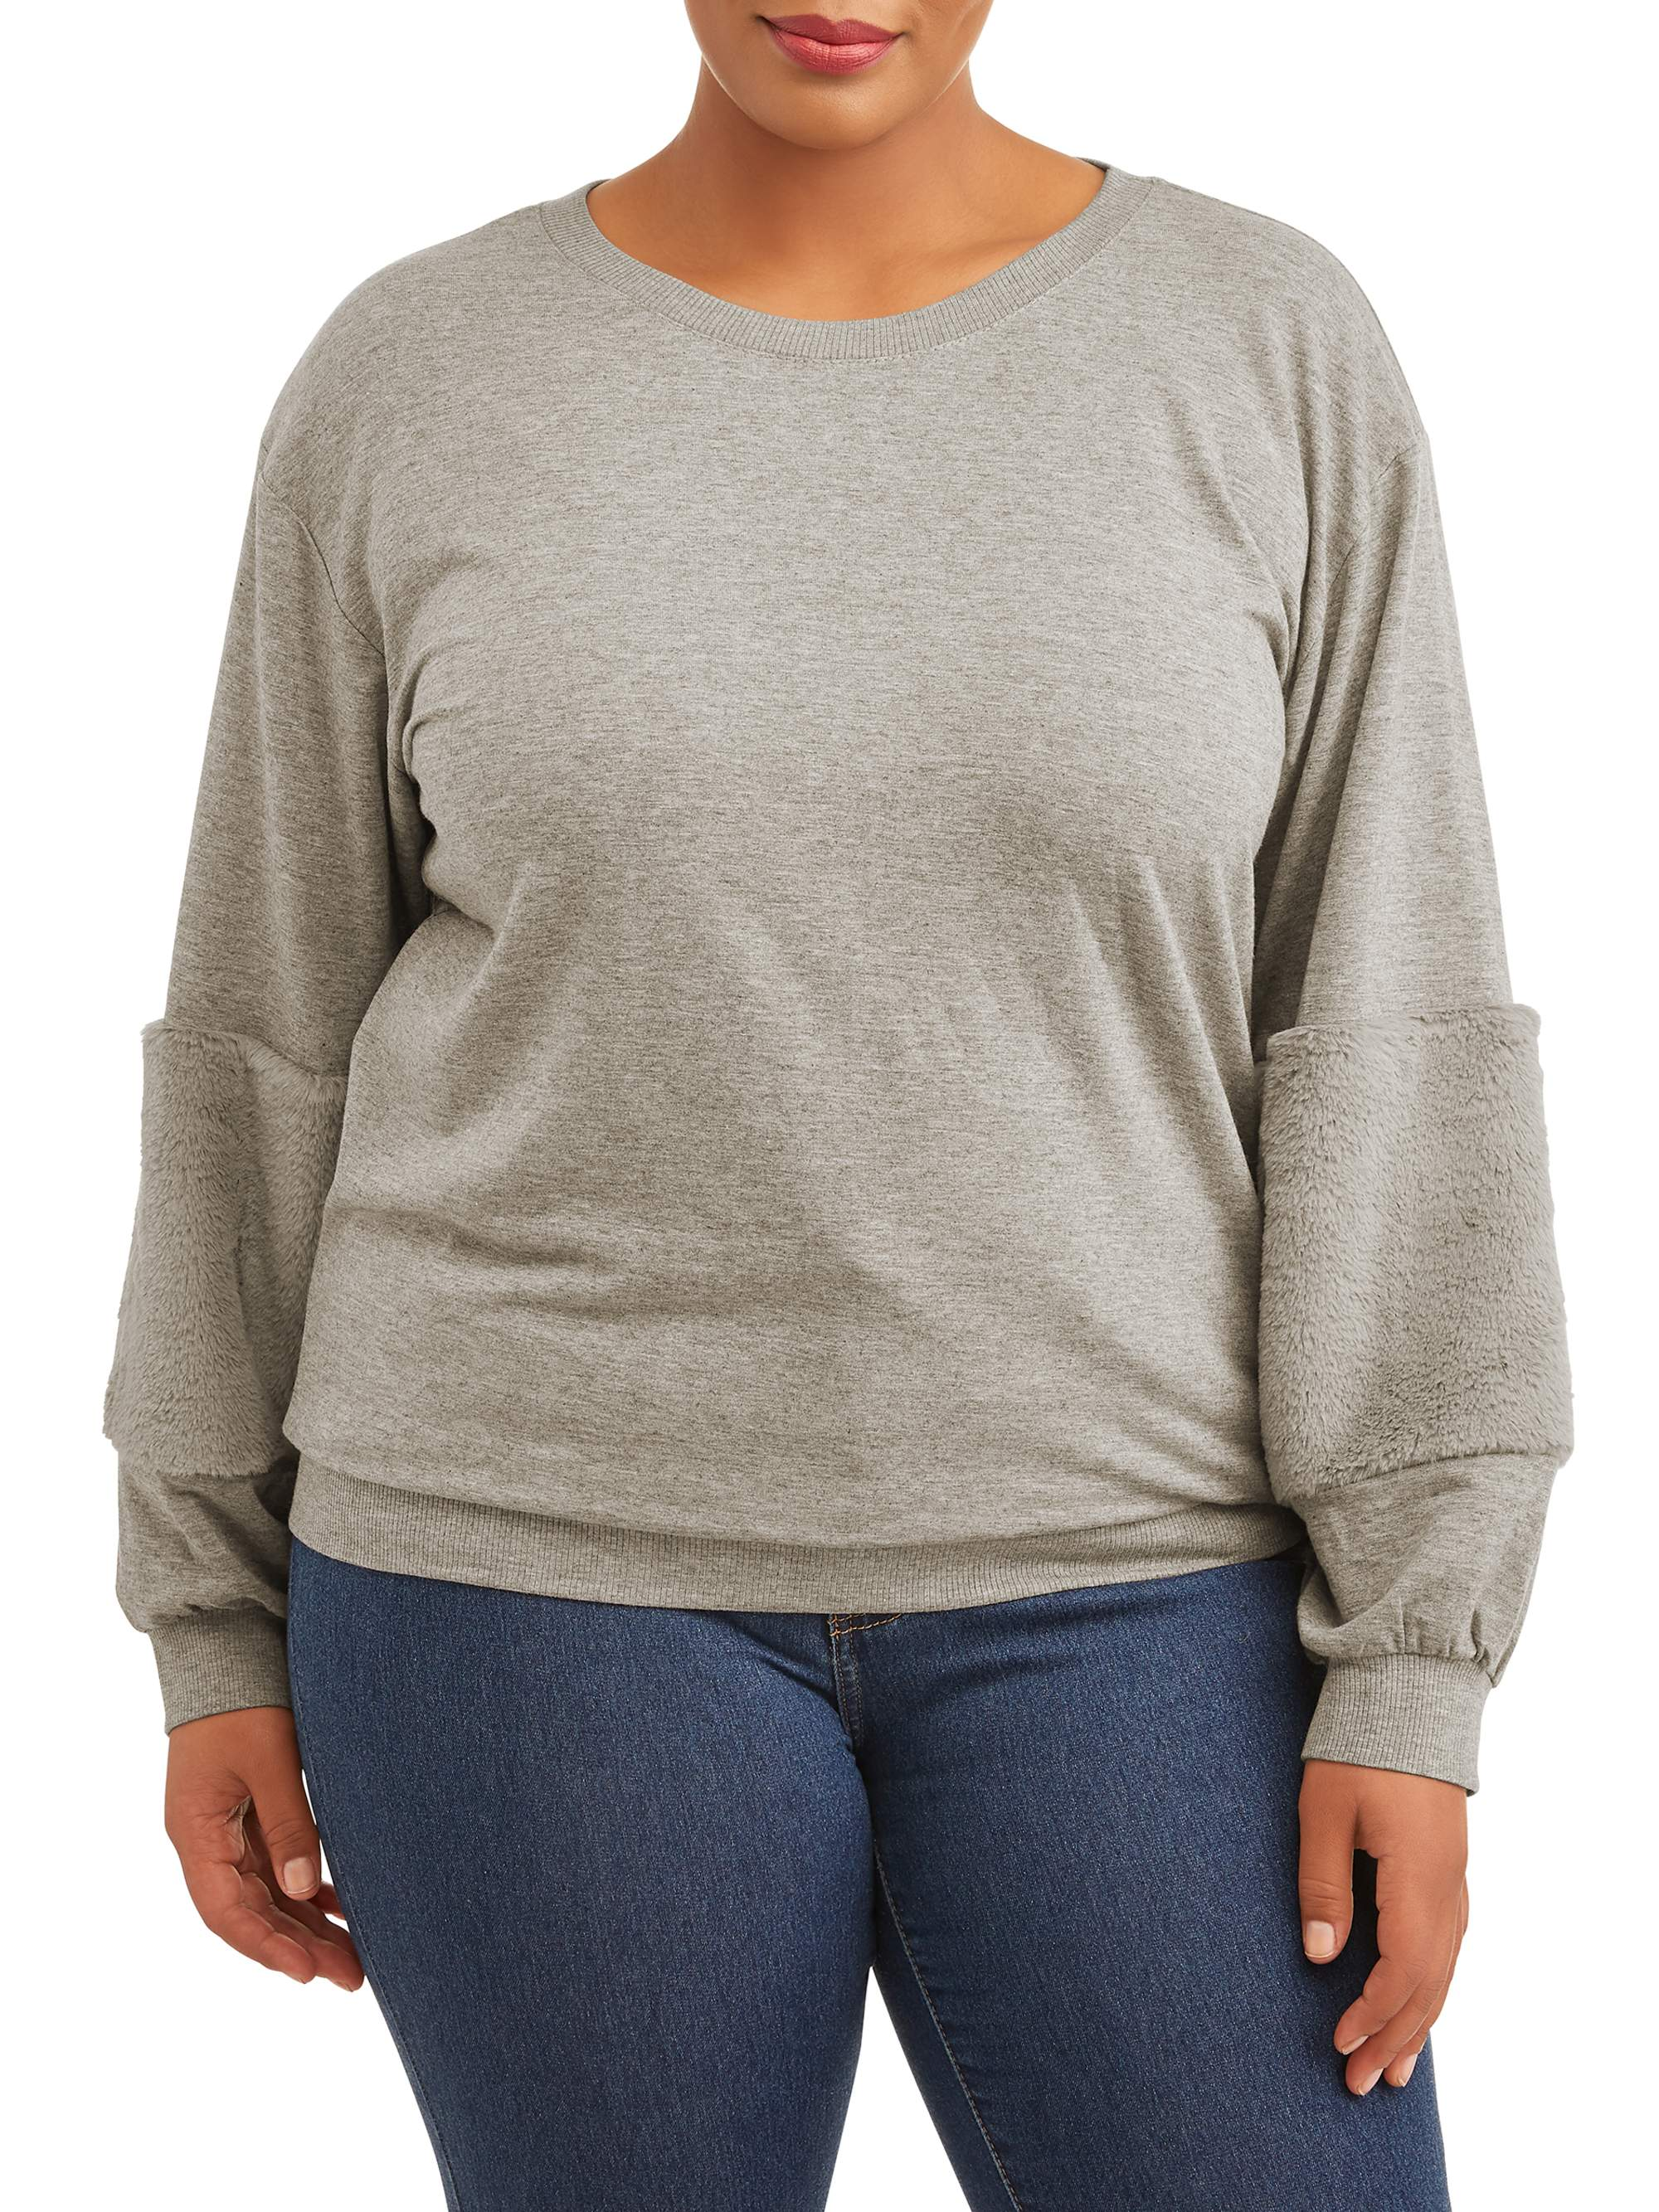 Juniors' Plus Size Faux Fur Trim Sleeve Sweater